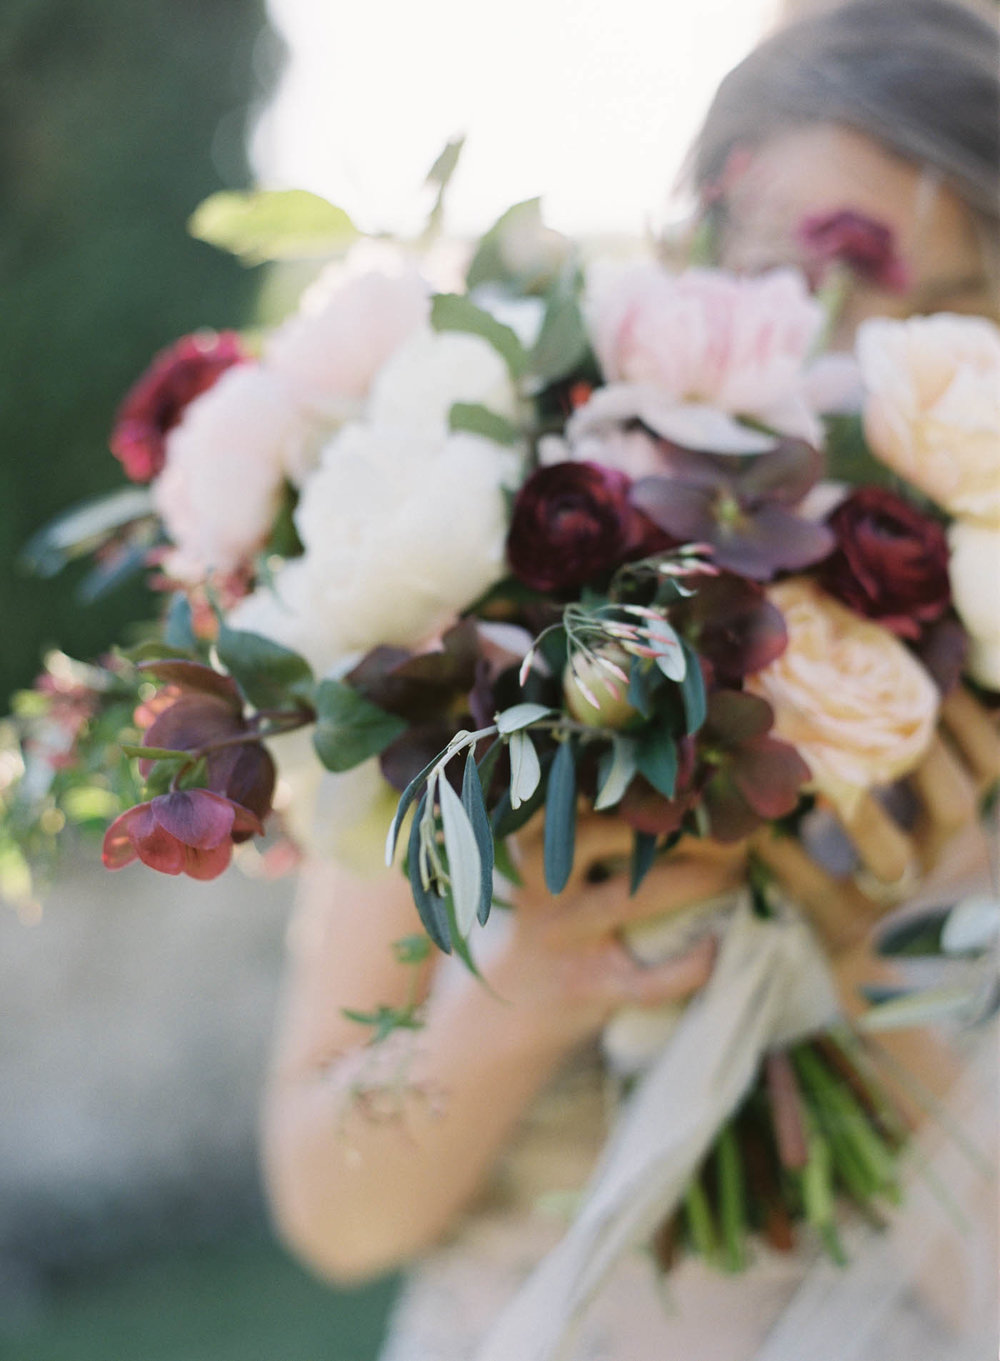 Villa_Cetinale_Wedding-46-Jen_Huang-ElanJacob-250-Jen_Huang-007305-R1-010.jpg